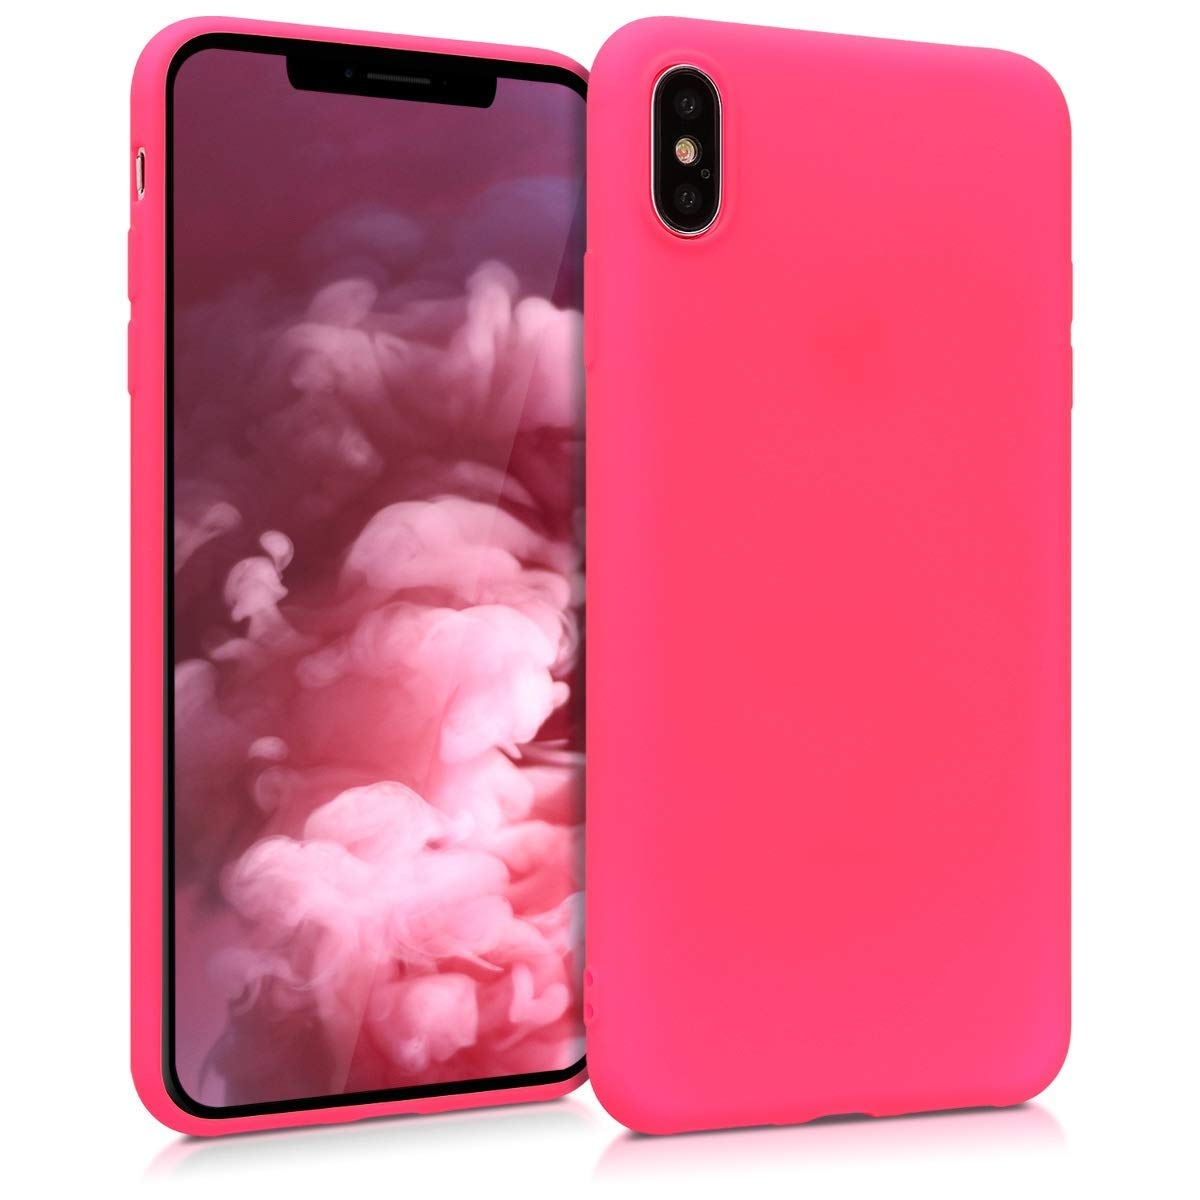 KW Θήκη Σιλικόνης iPhone XS Max - Neon Pink (45917.77)